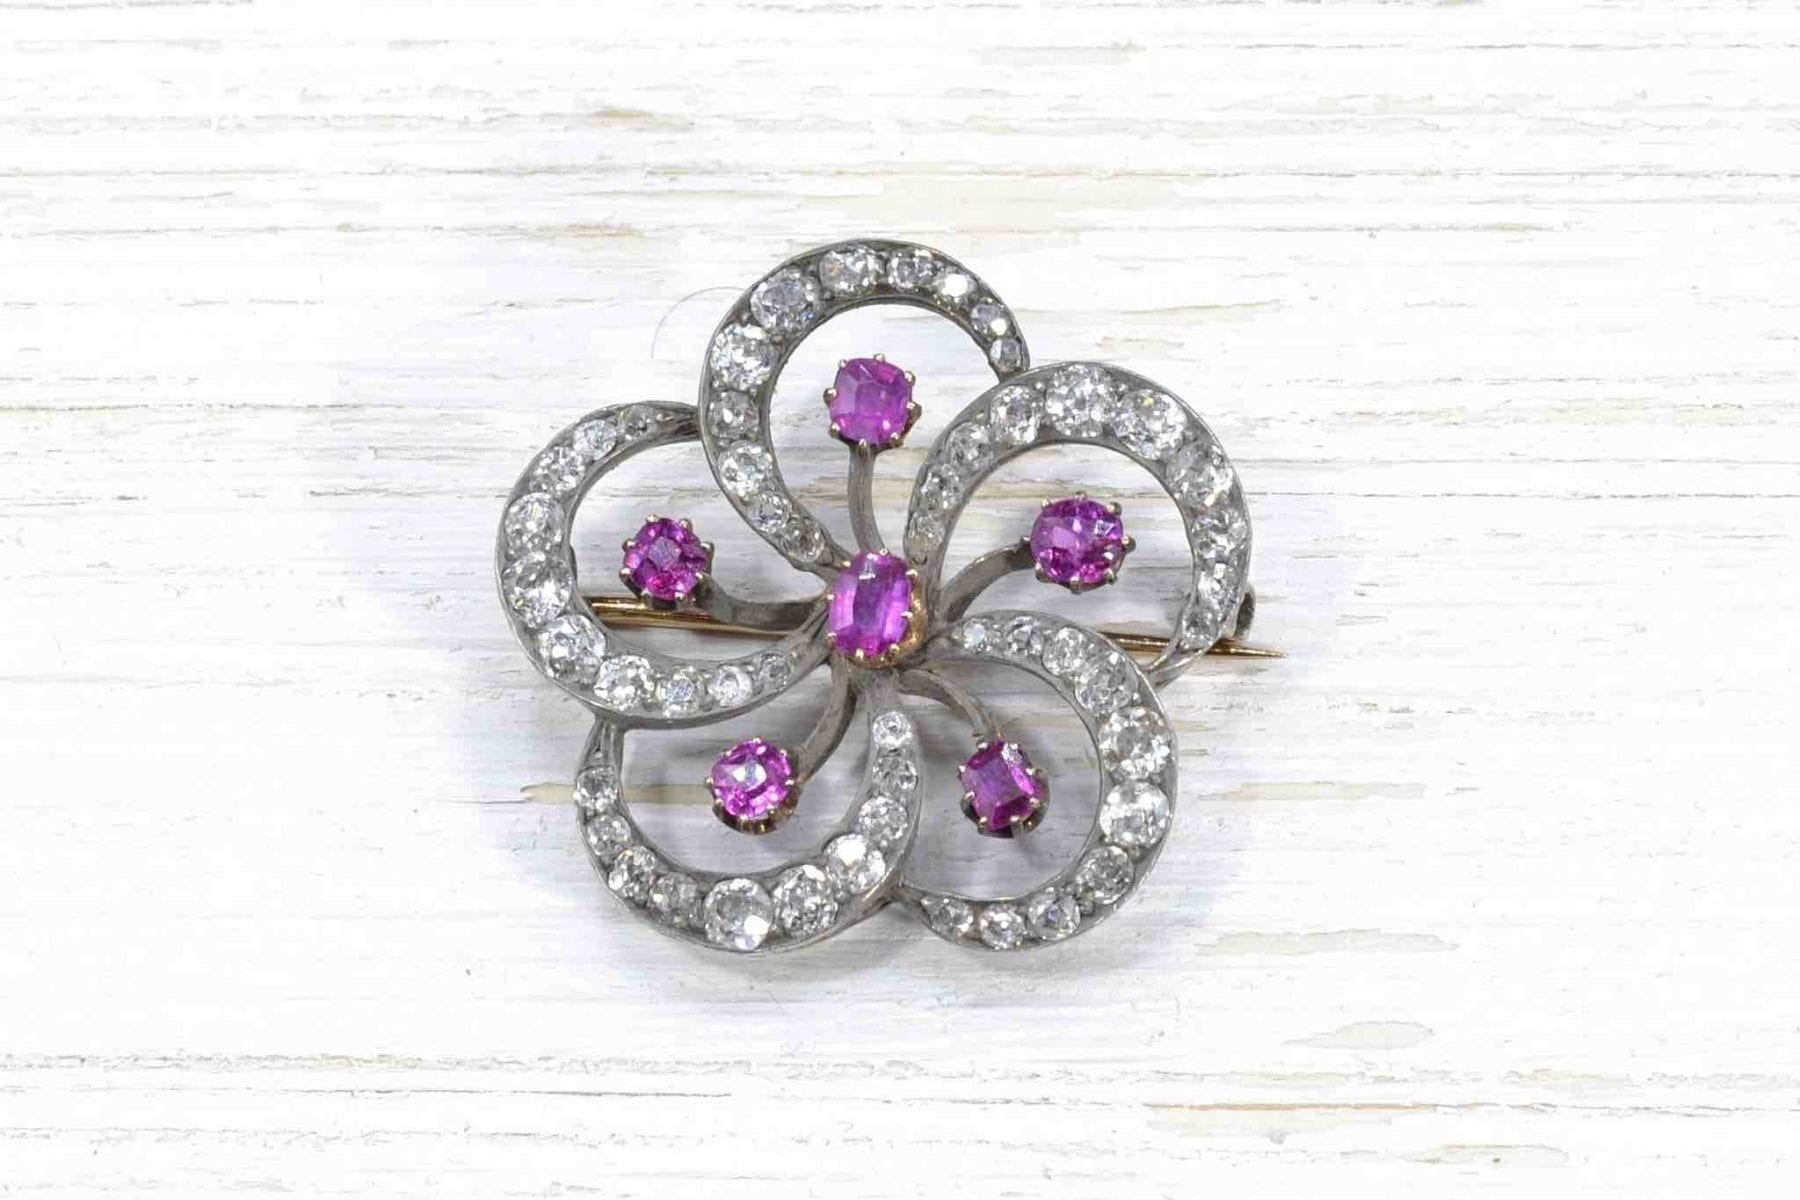 Broche rubis et diamants